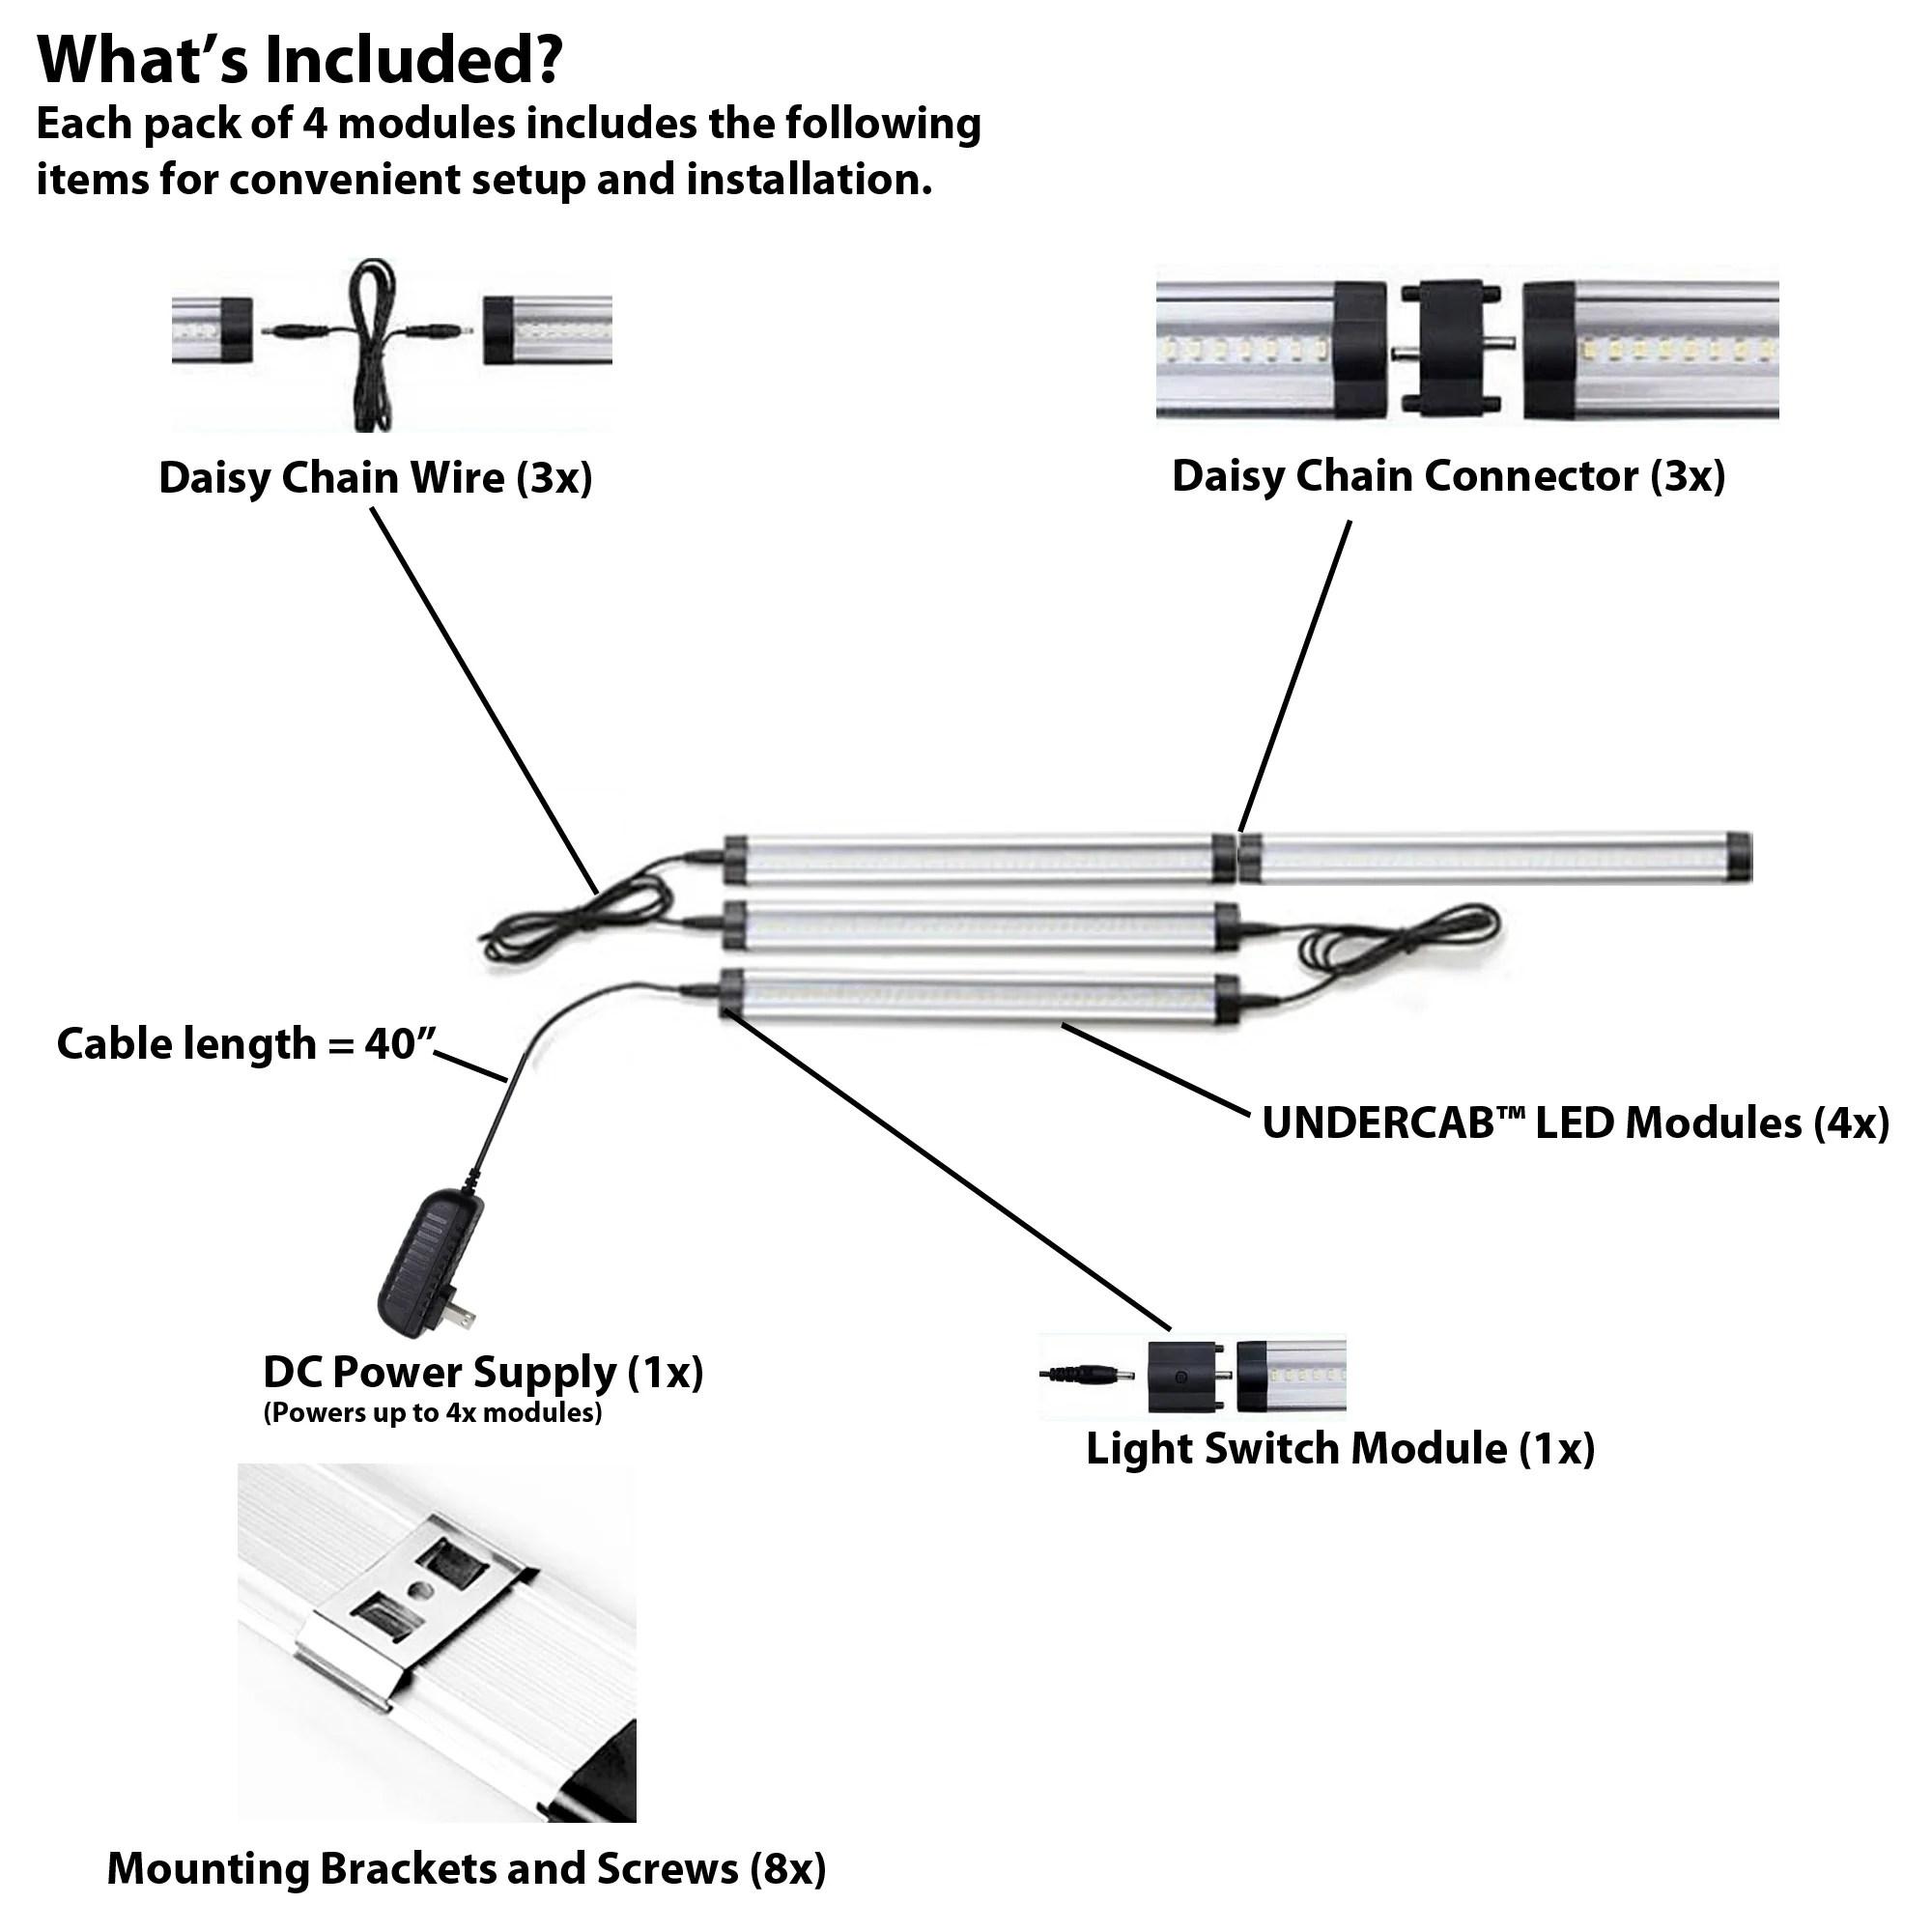 undercab 95 cri led under cabinet light modules [ 2000 x 2000 Pixel ]